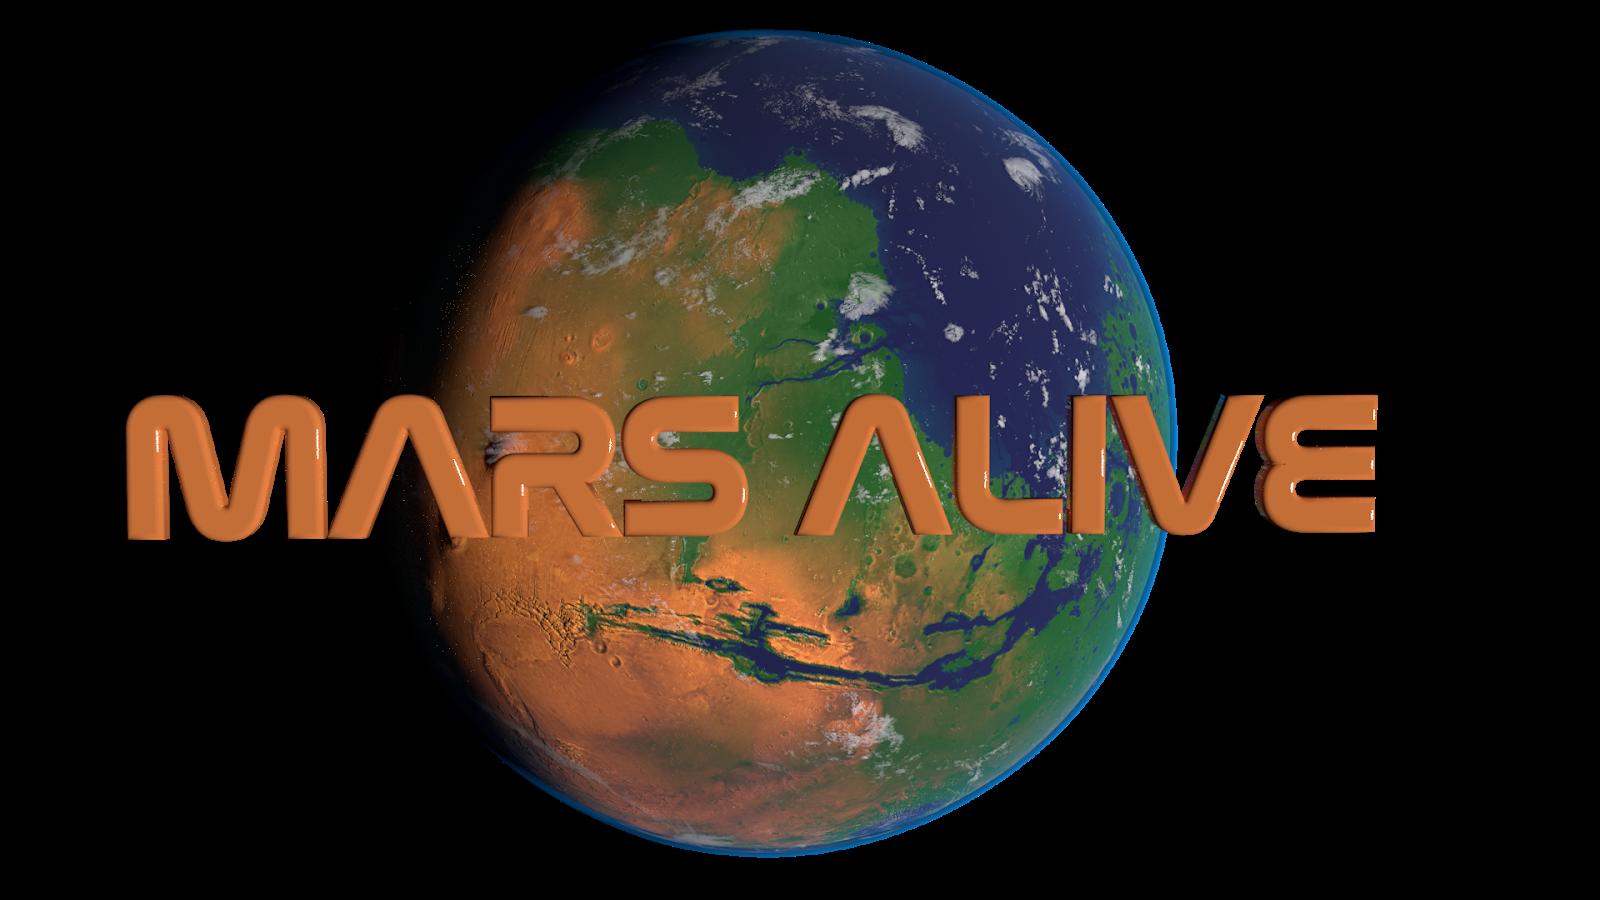 Mars Alive